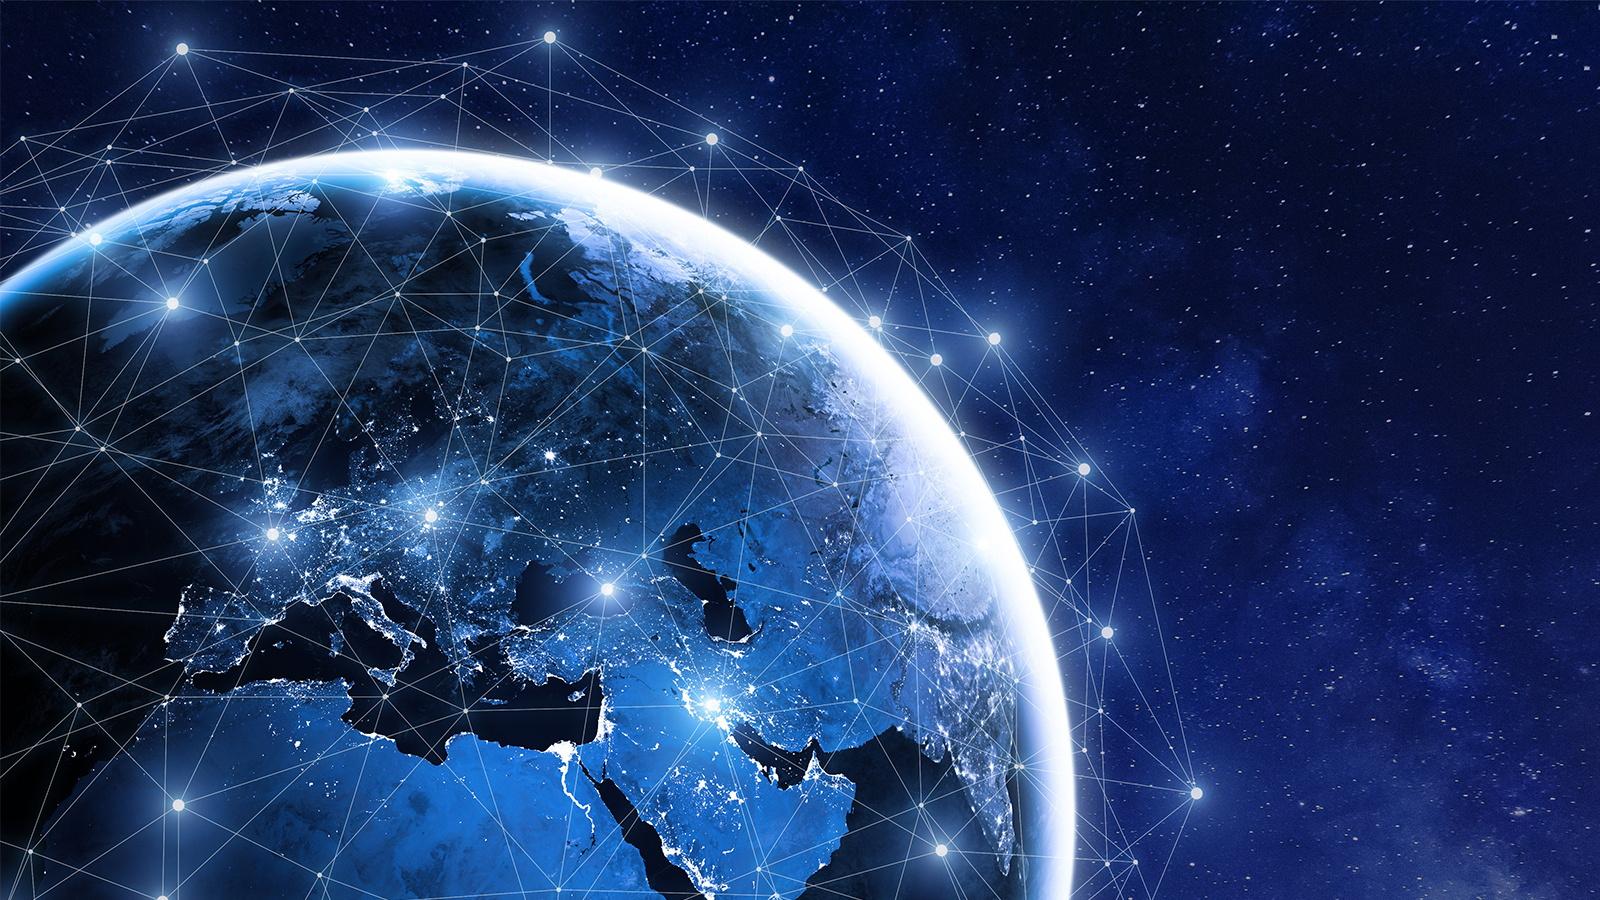 What is Double VPN & How to Chain VPN Servers? - TechNadu com